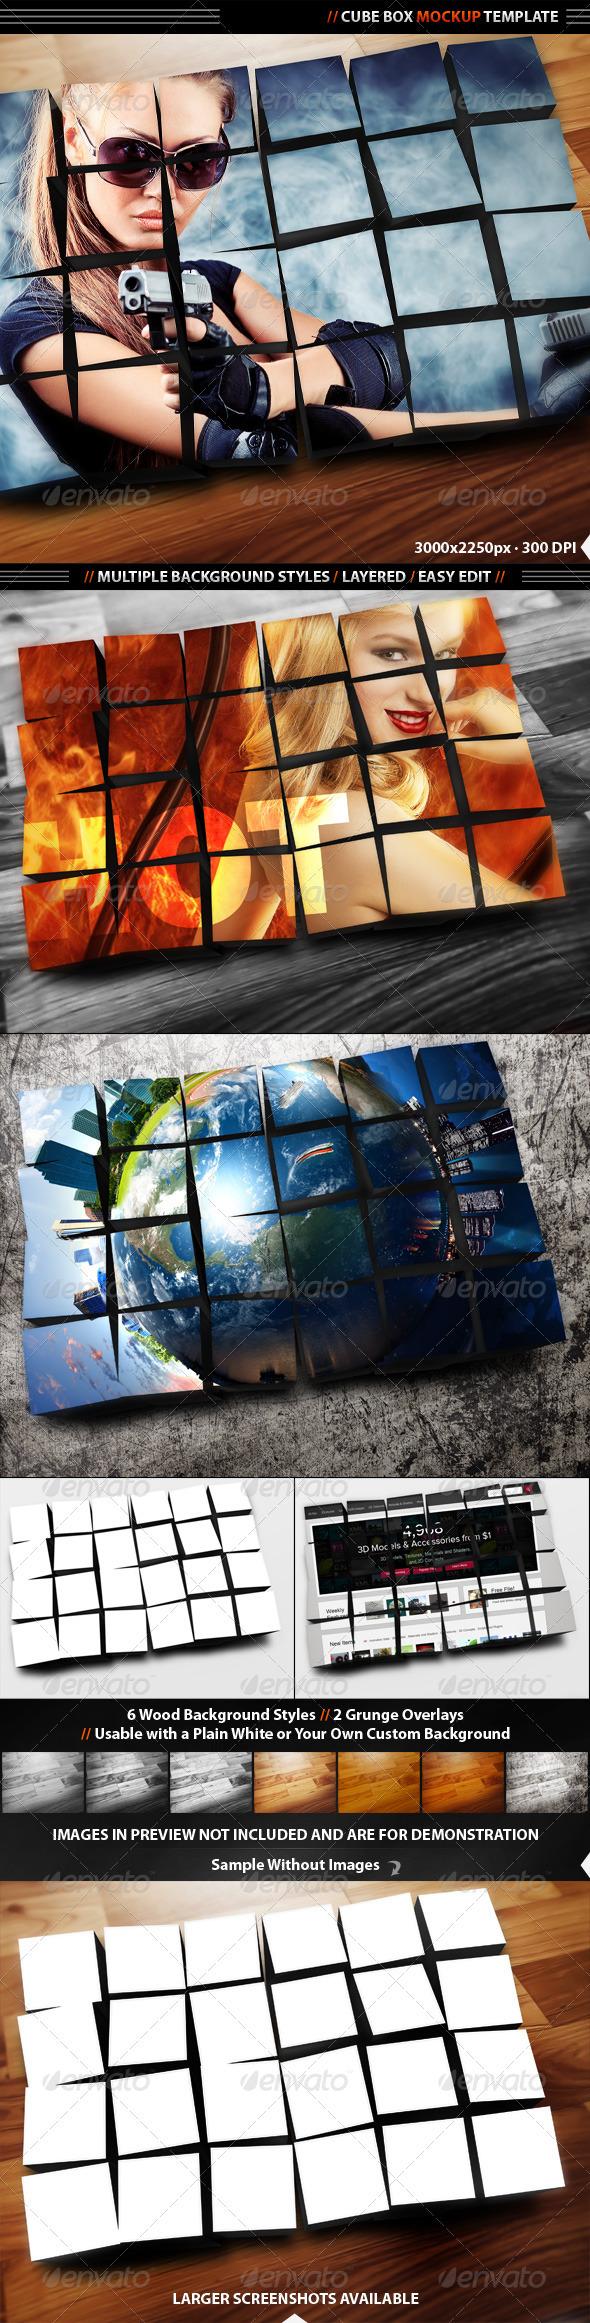 Cube Box Display Mockup - Miscellaneous Displays